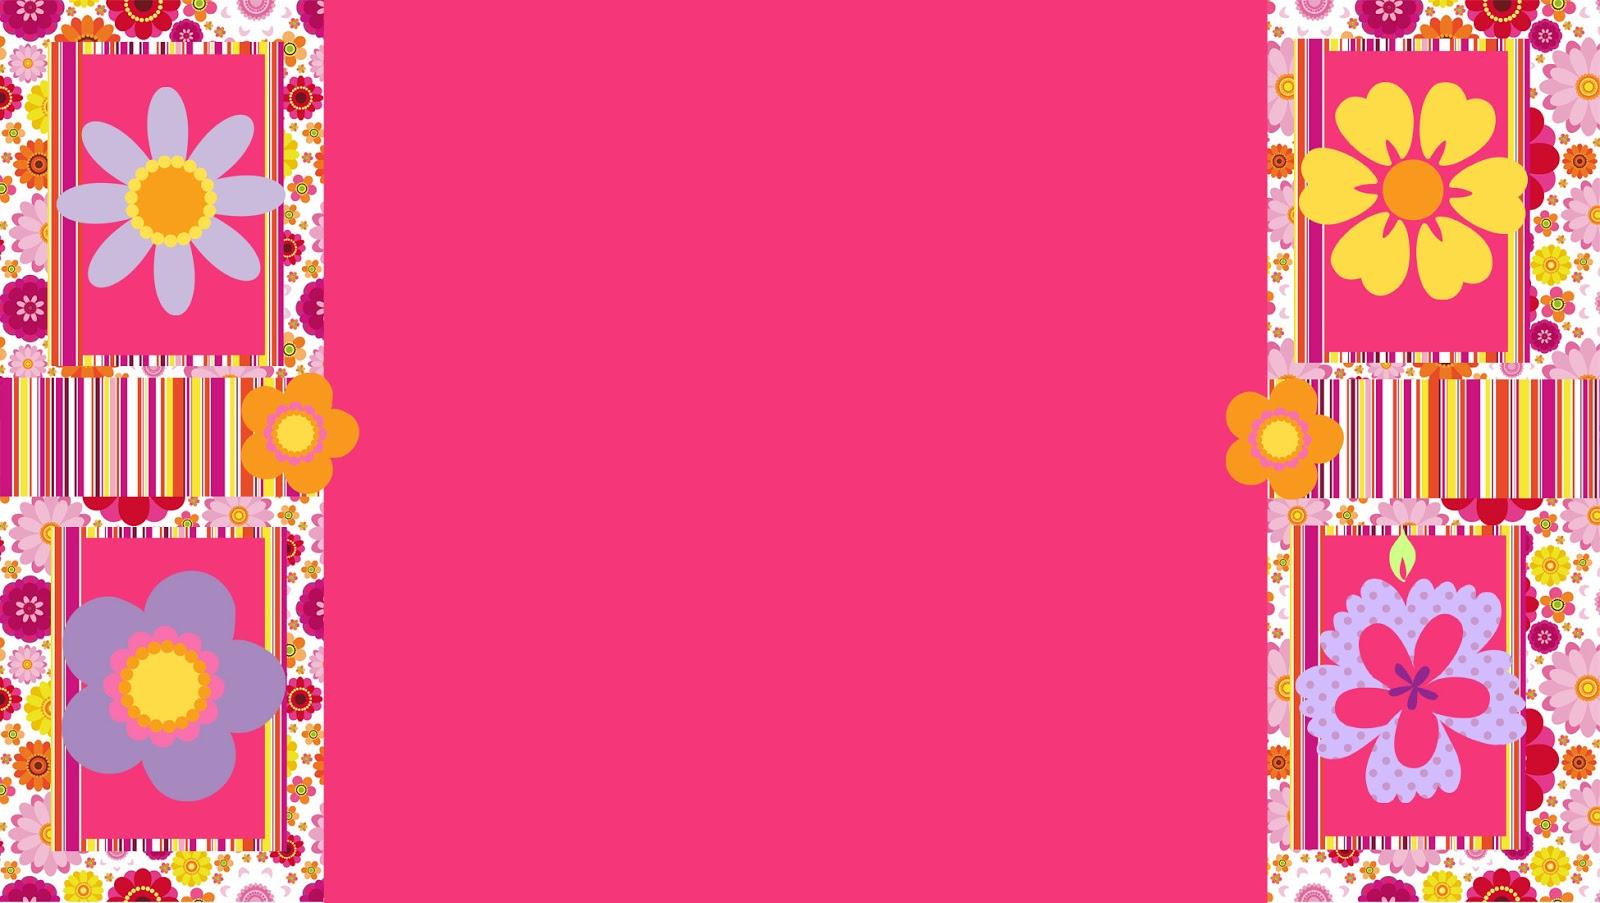 Pink Blog Background 1600x903 pixel Nature HD Wallpaper 34765 1600x903